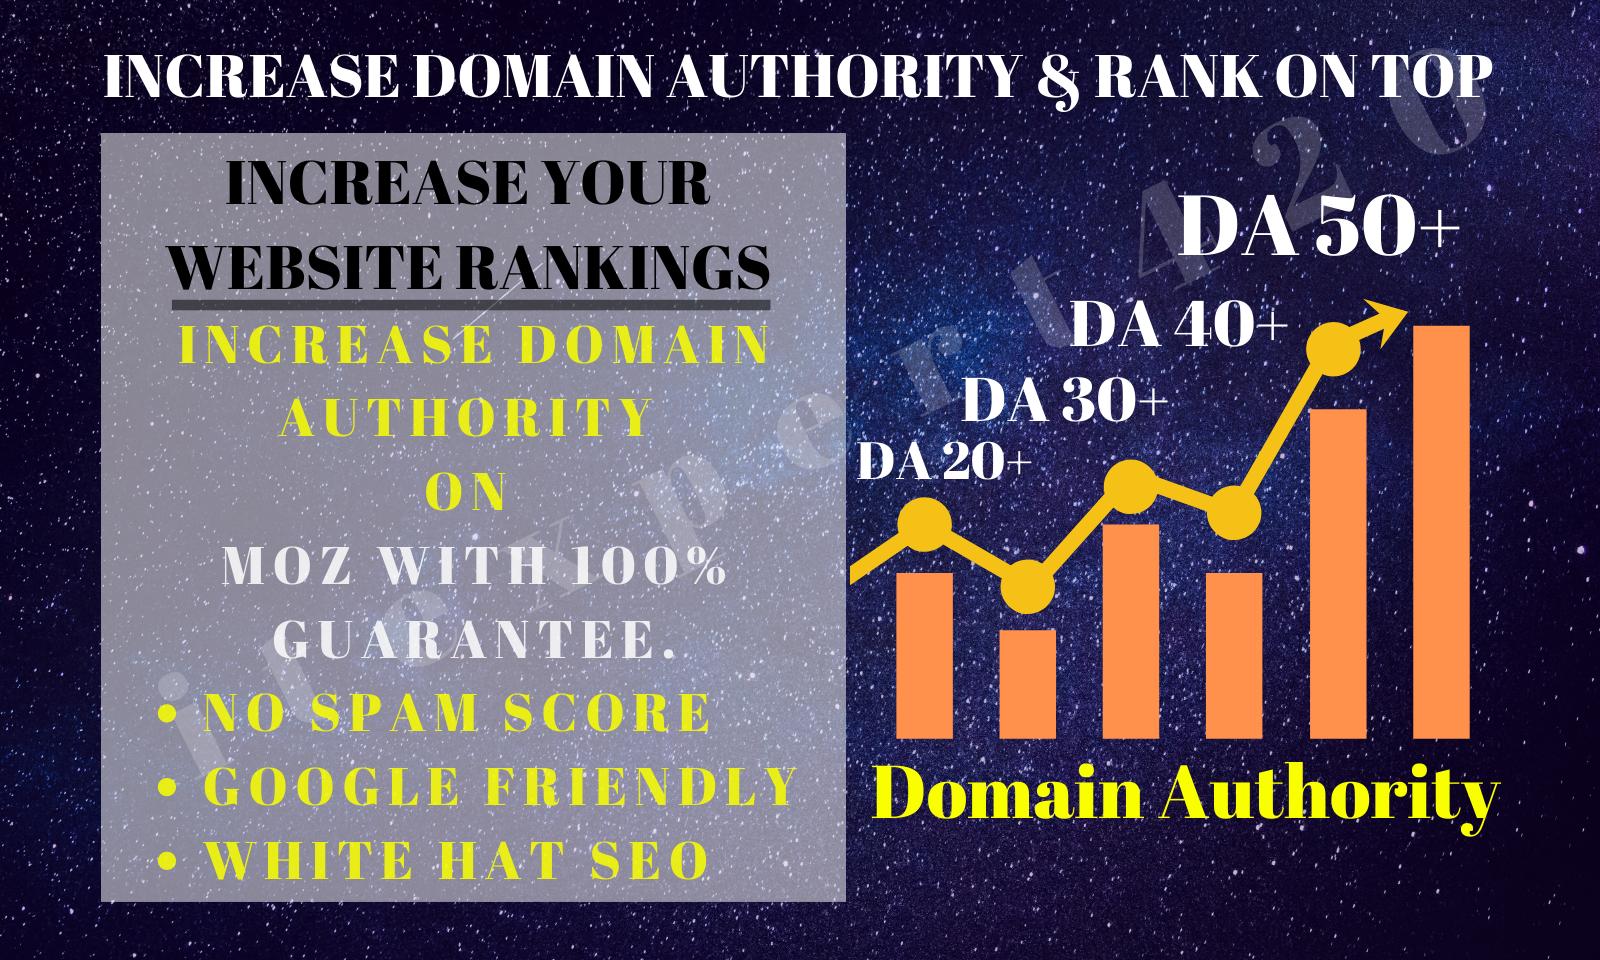 I will increase domain authority 100 Guarantee